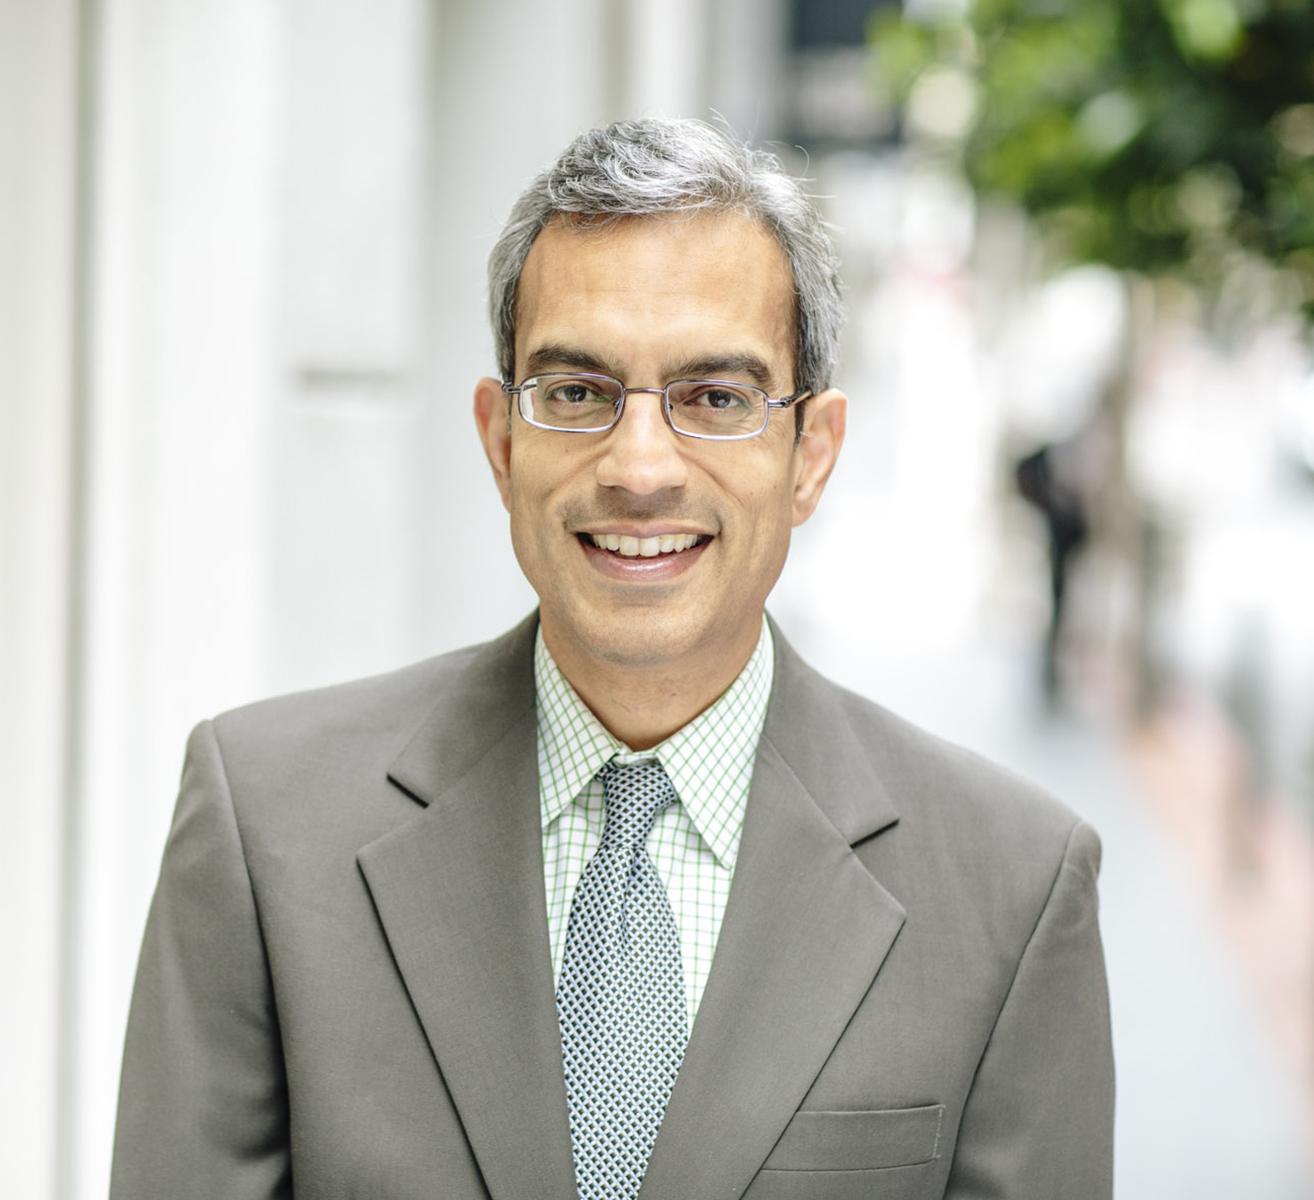 Asim Bhansali: Kwun Bhansali Lazarus LLP